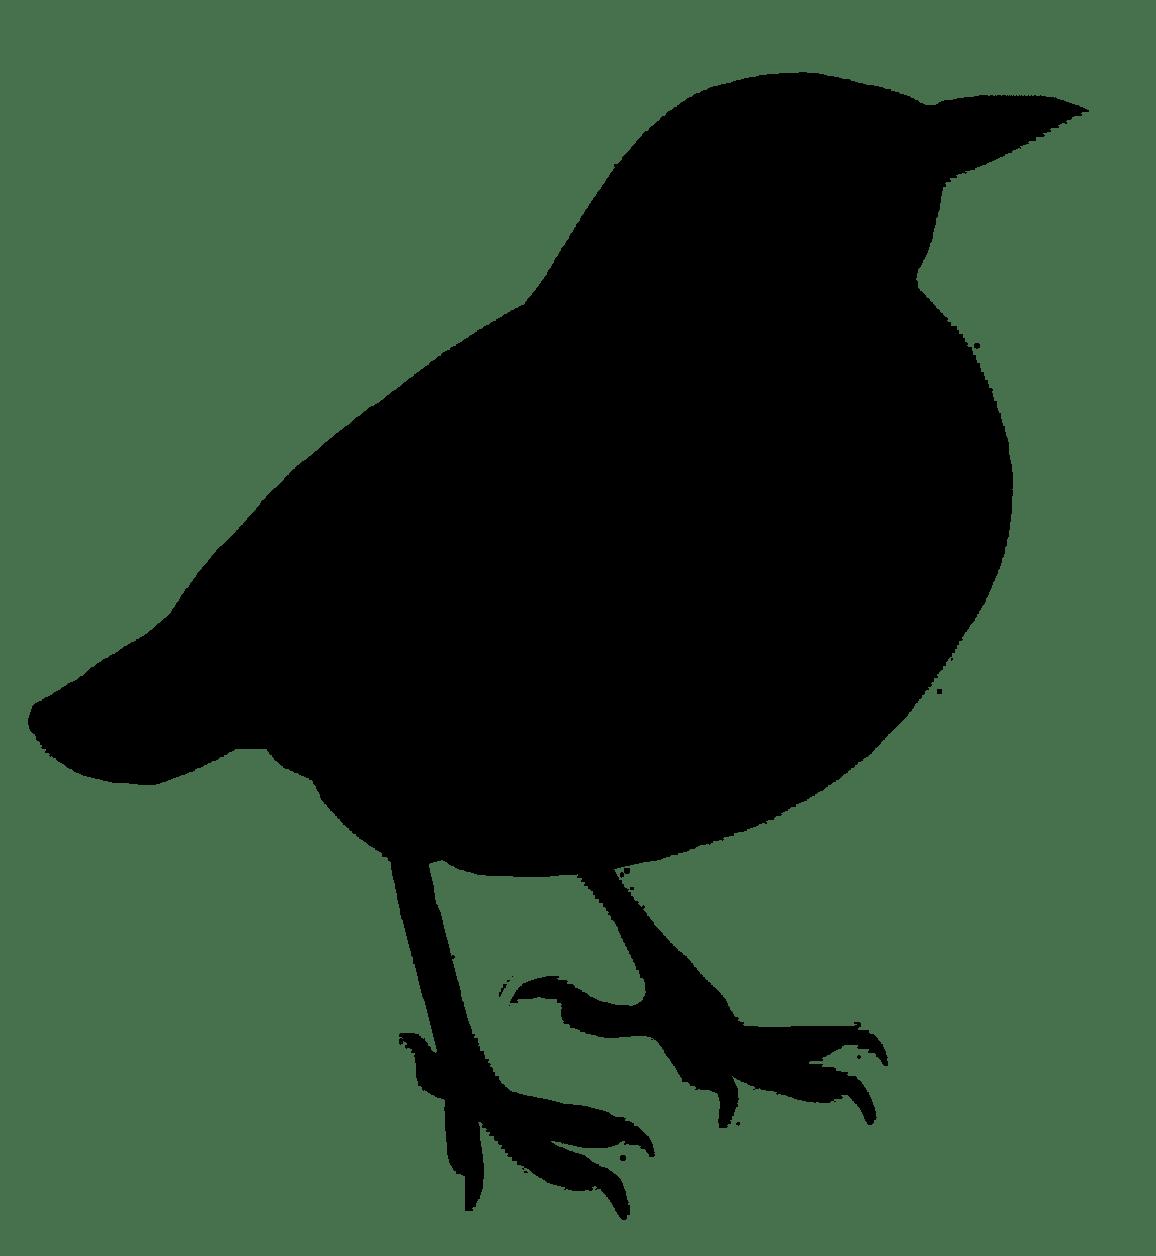 Simple Bird Silhouette at GetDrawings | Free download